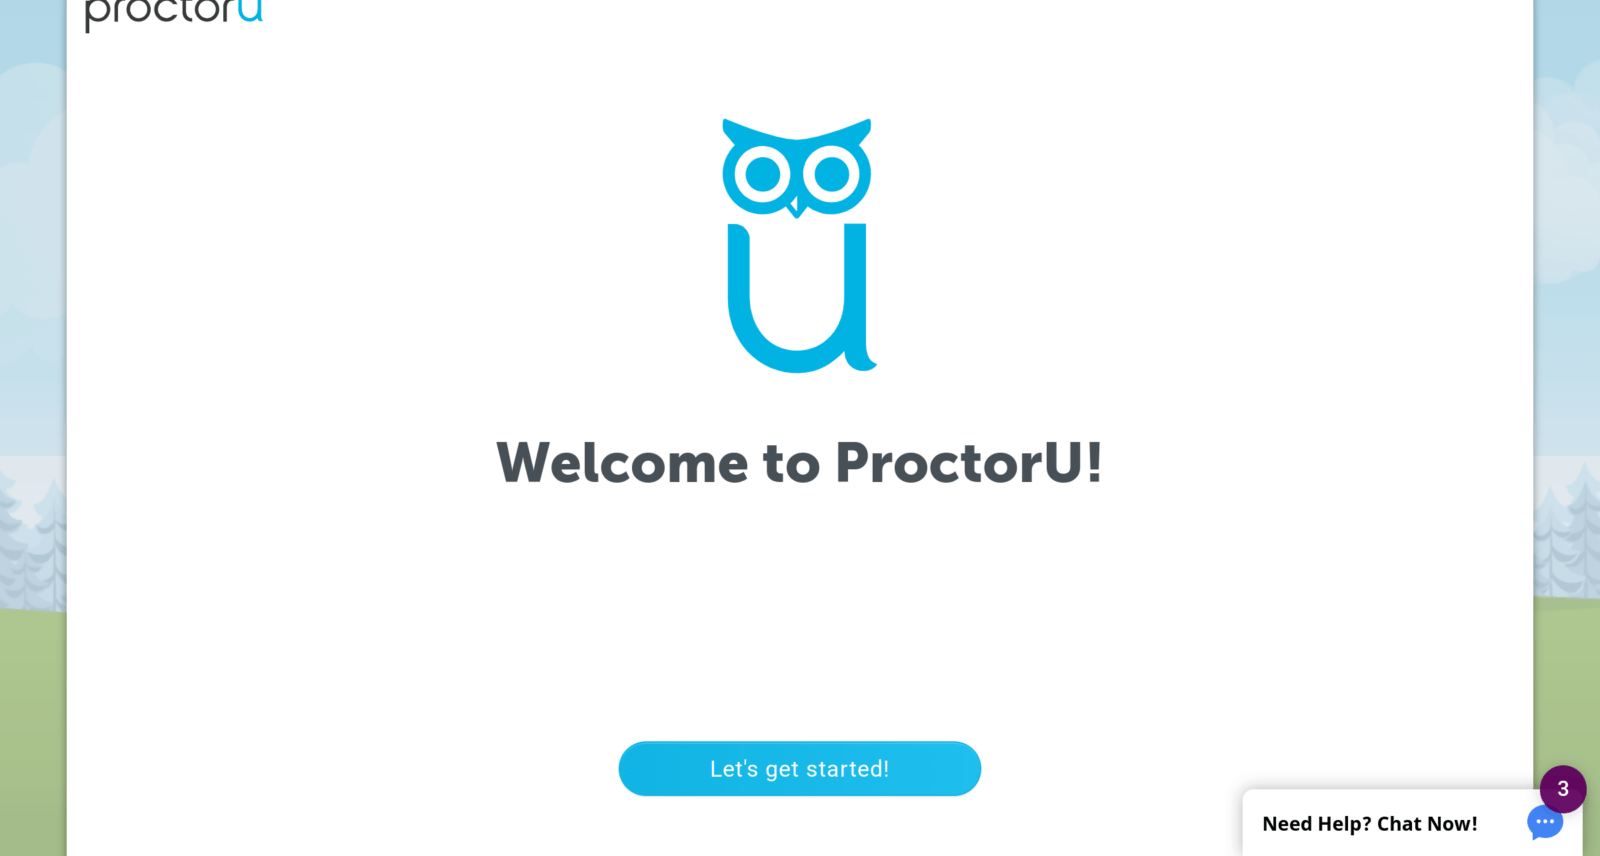 Proctor U: Welcome to ProctorU!